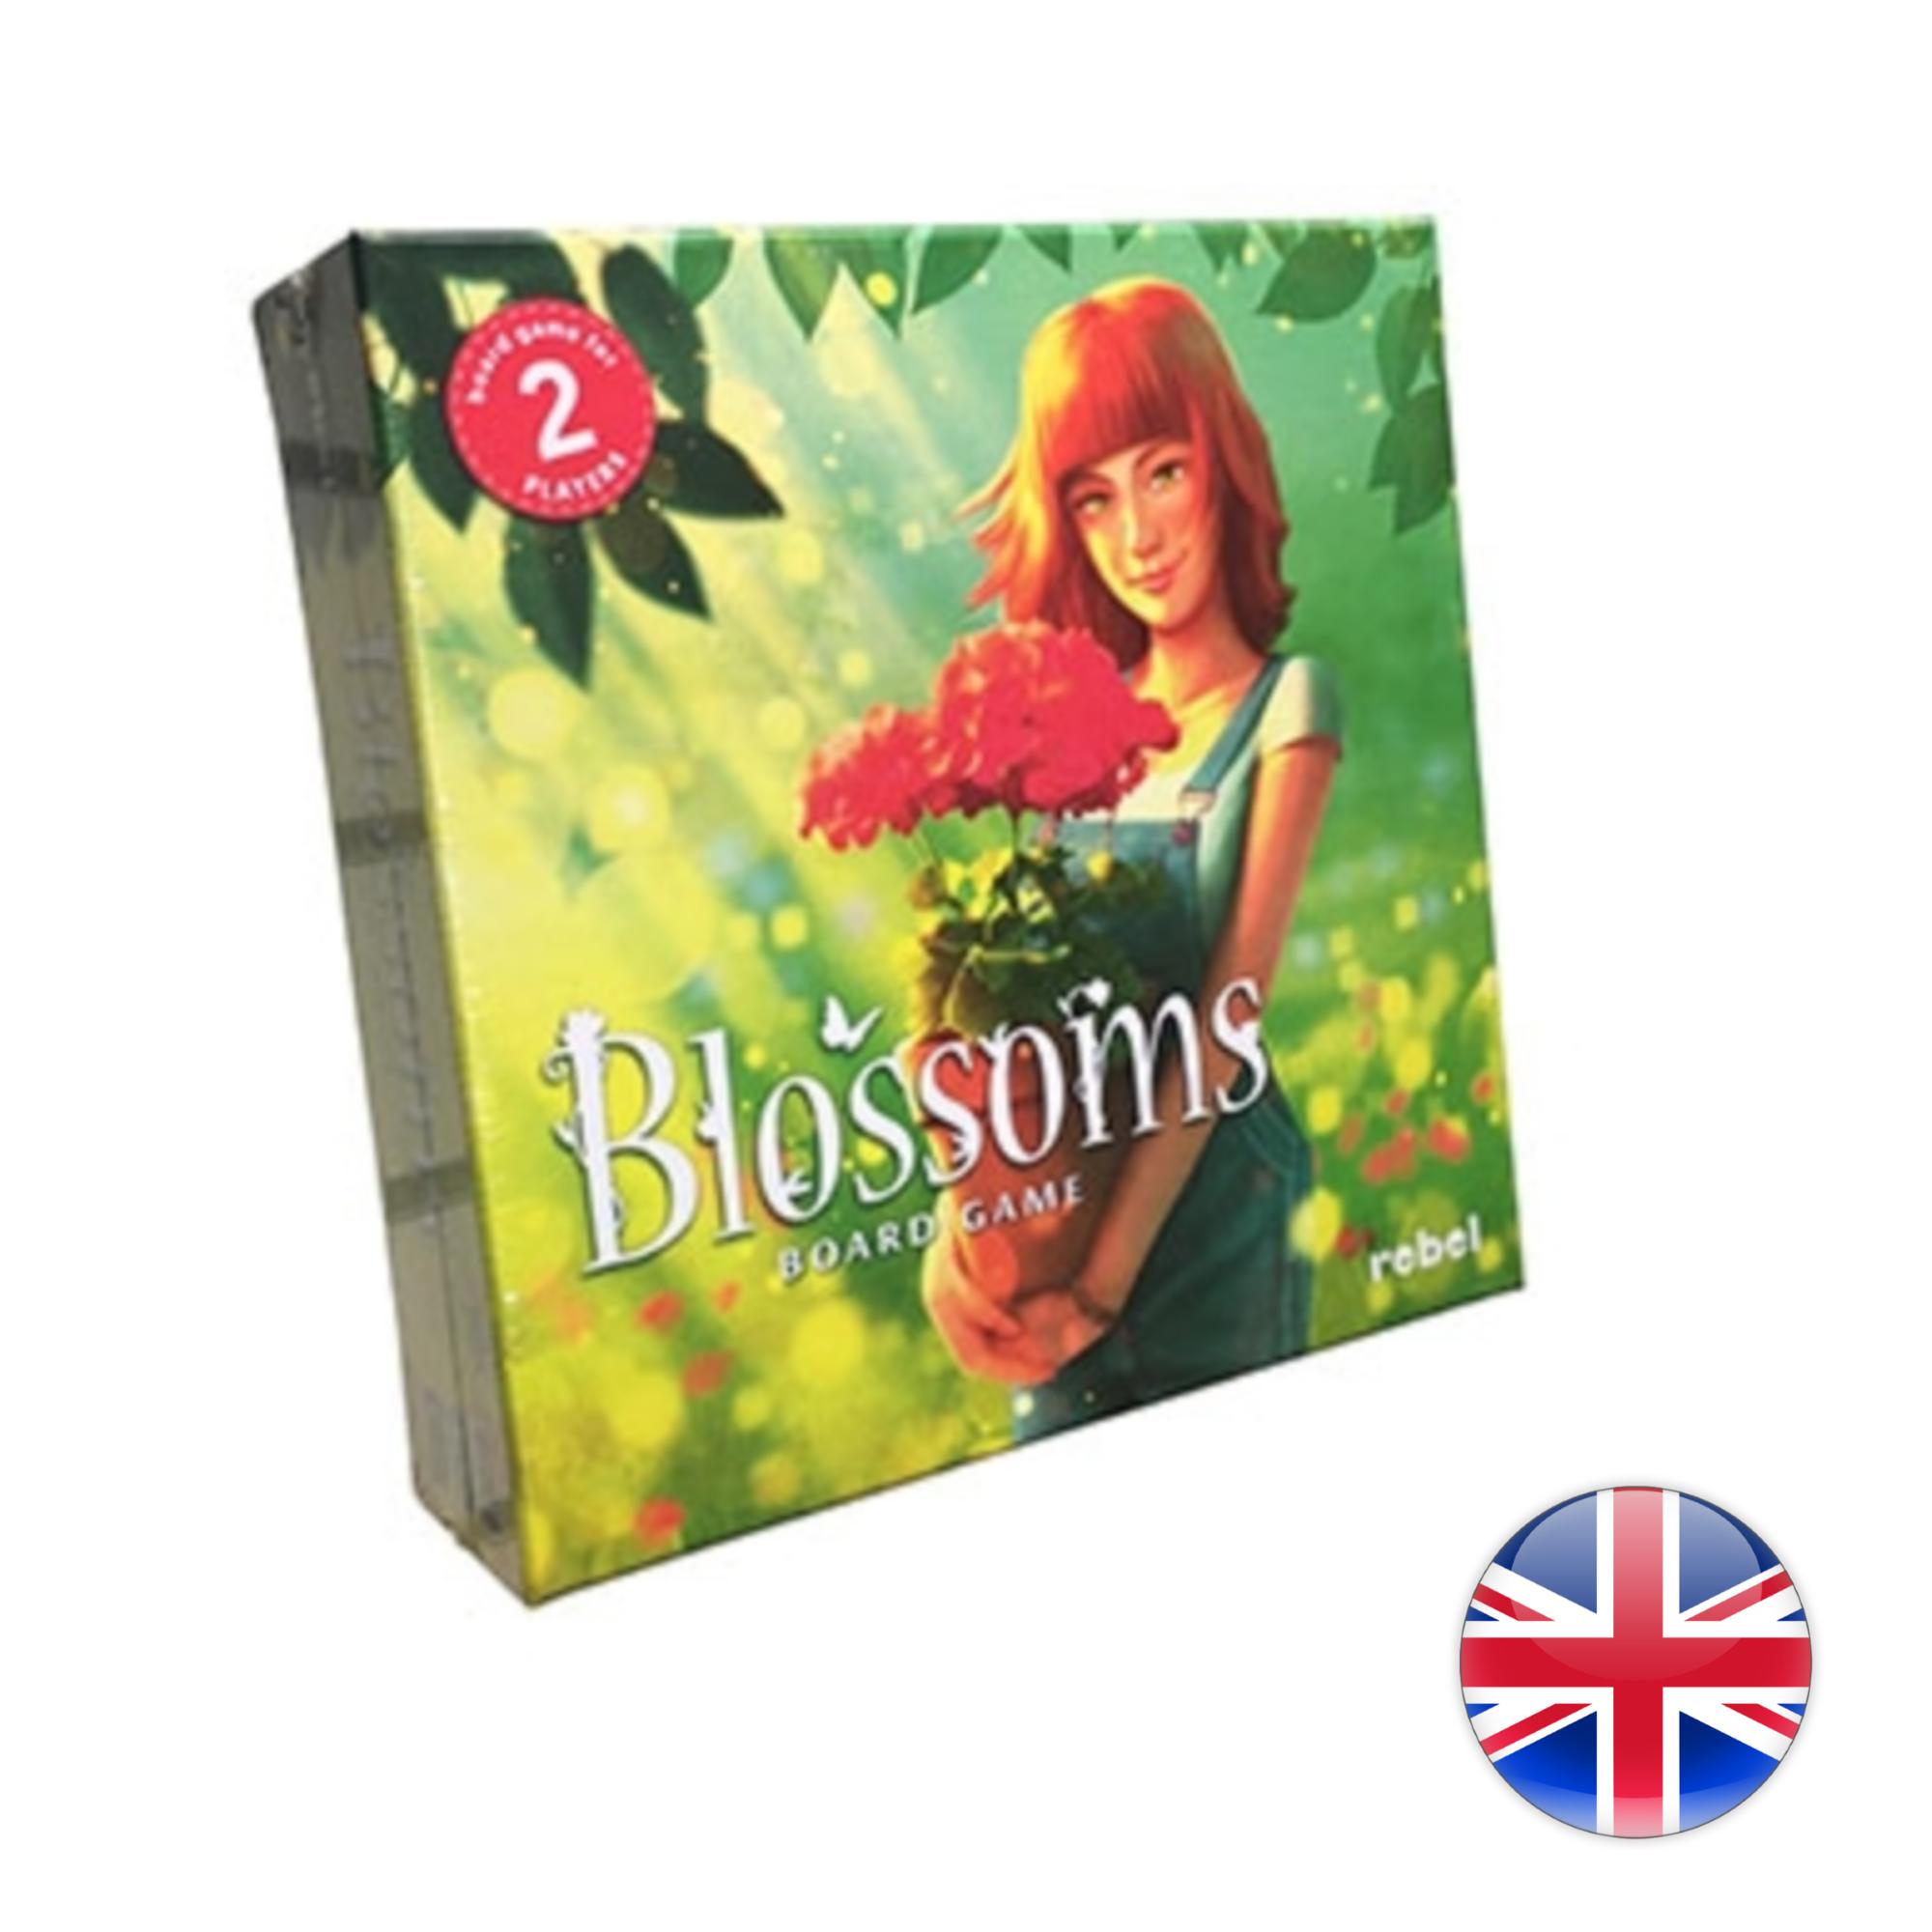 REBEL Games Blossoms